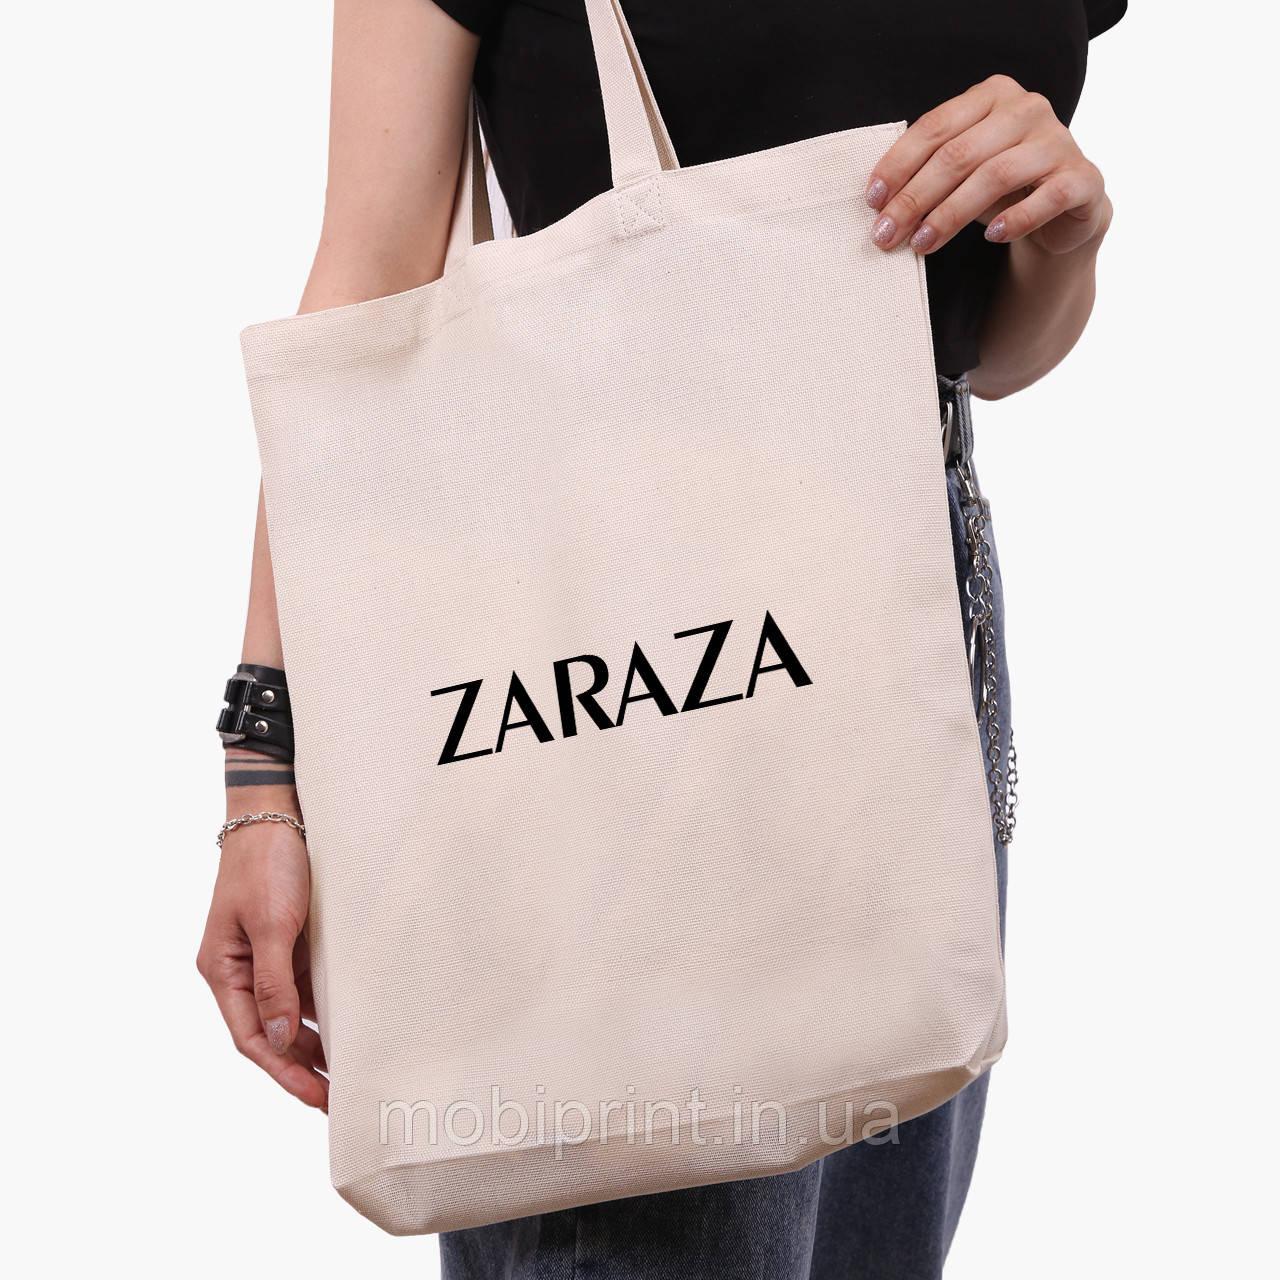 Эко сумка шоппер белая ZARAZA (9227-1782-1)  экосумка шопер 41*39*8 см